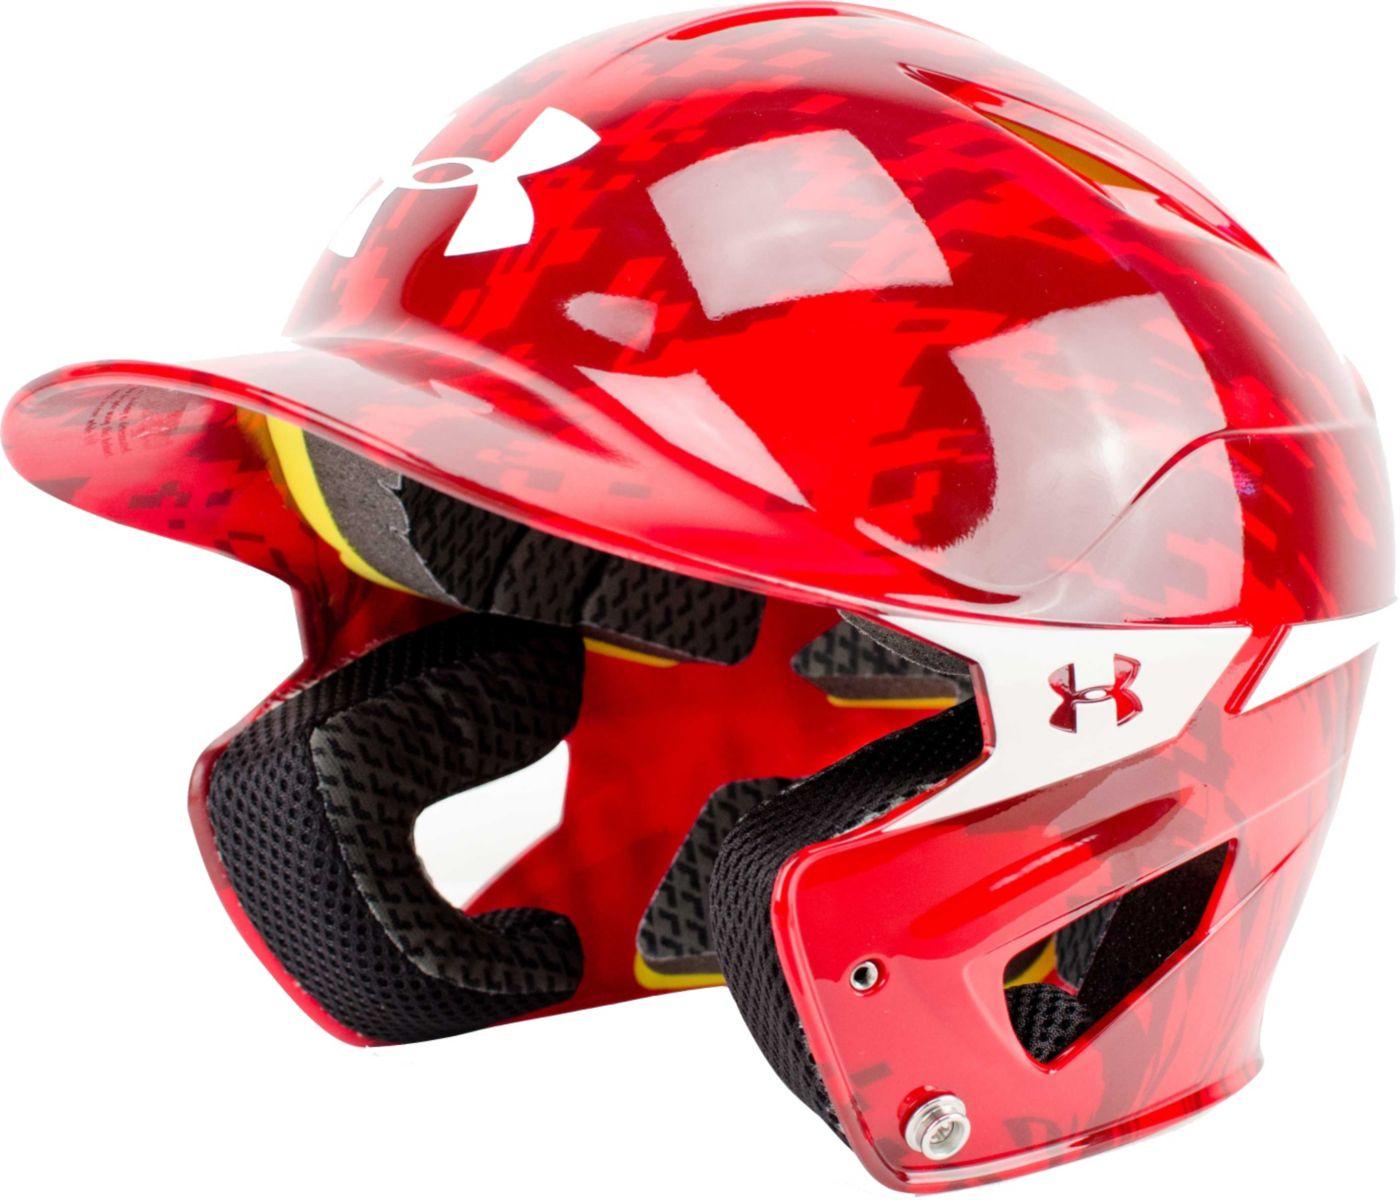 Under Armour OSFM Heater Digi Camo Batting Helmet